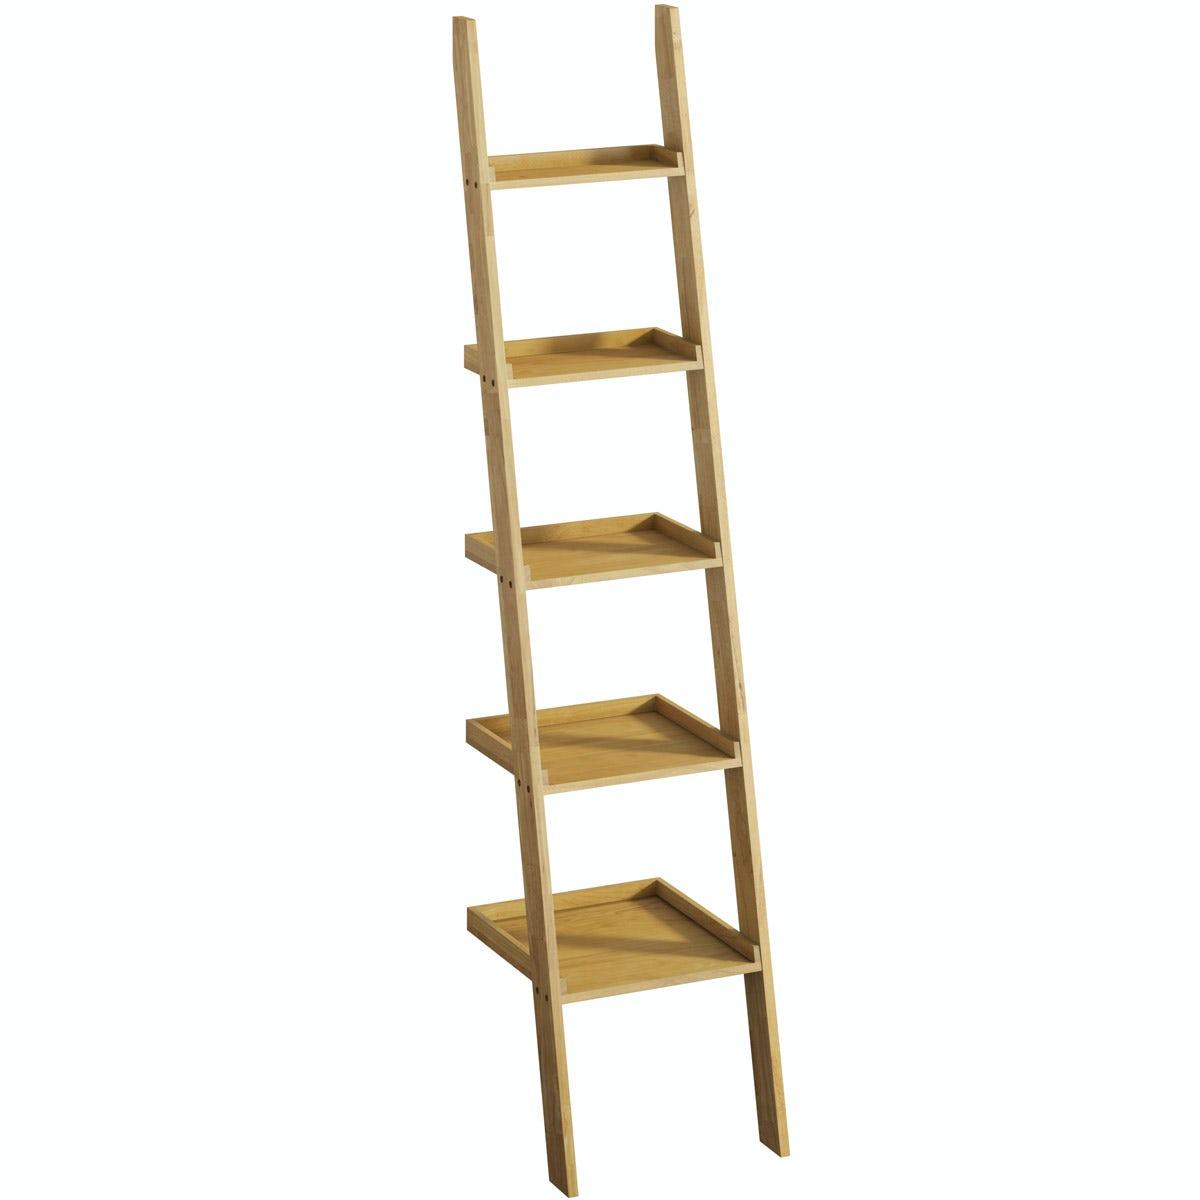 Mode South Bank natural wood ladder shelf